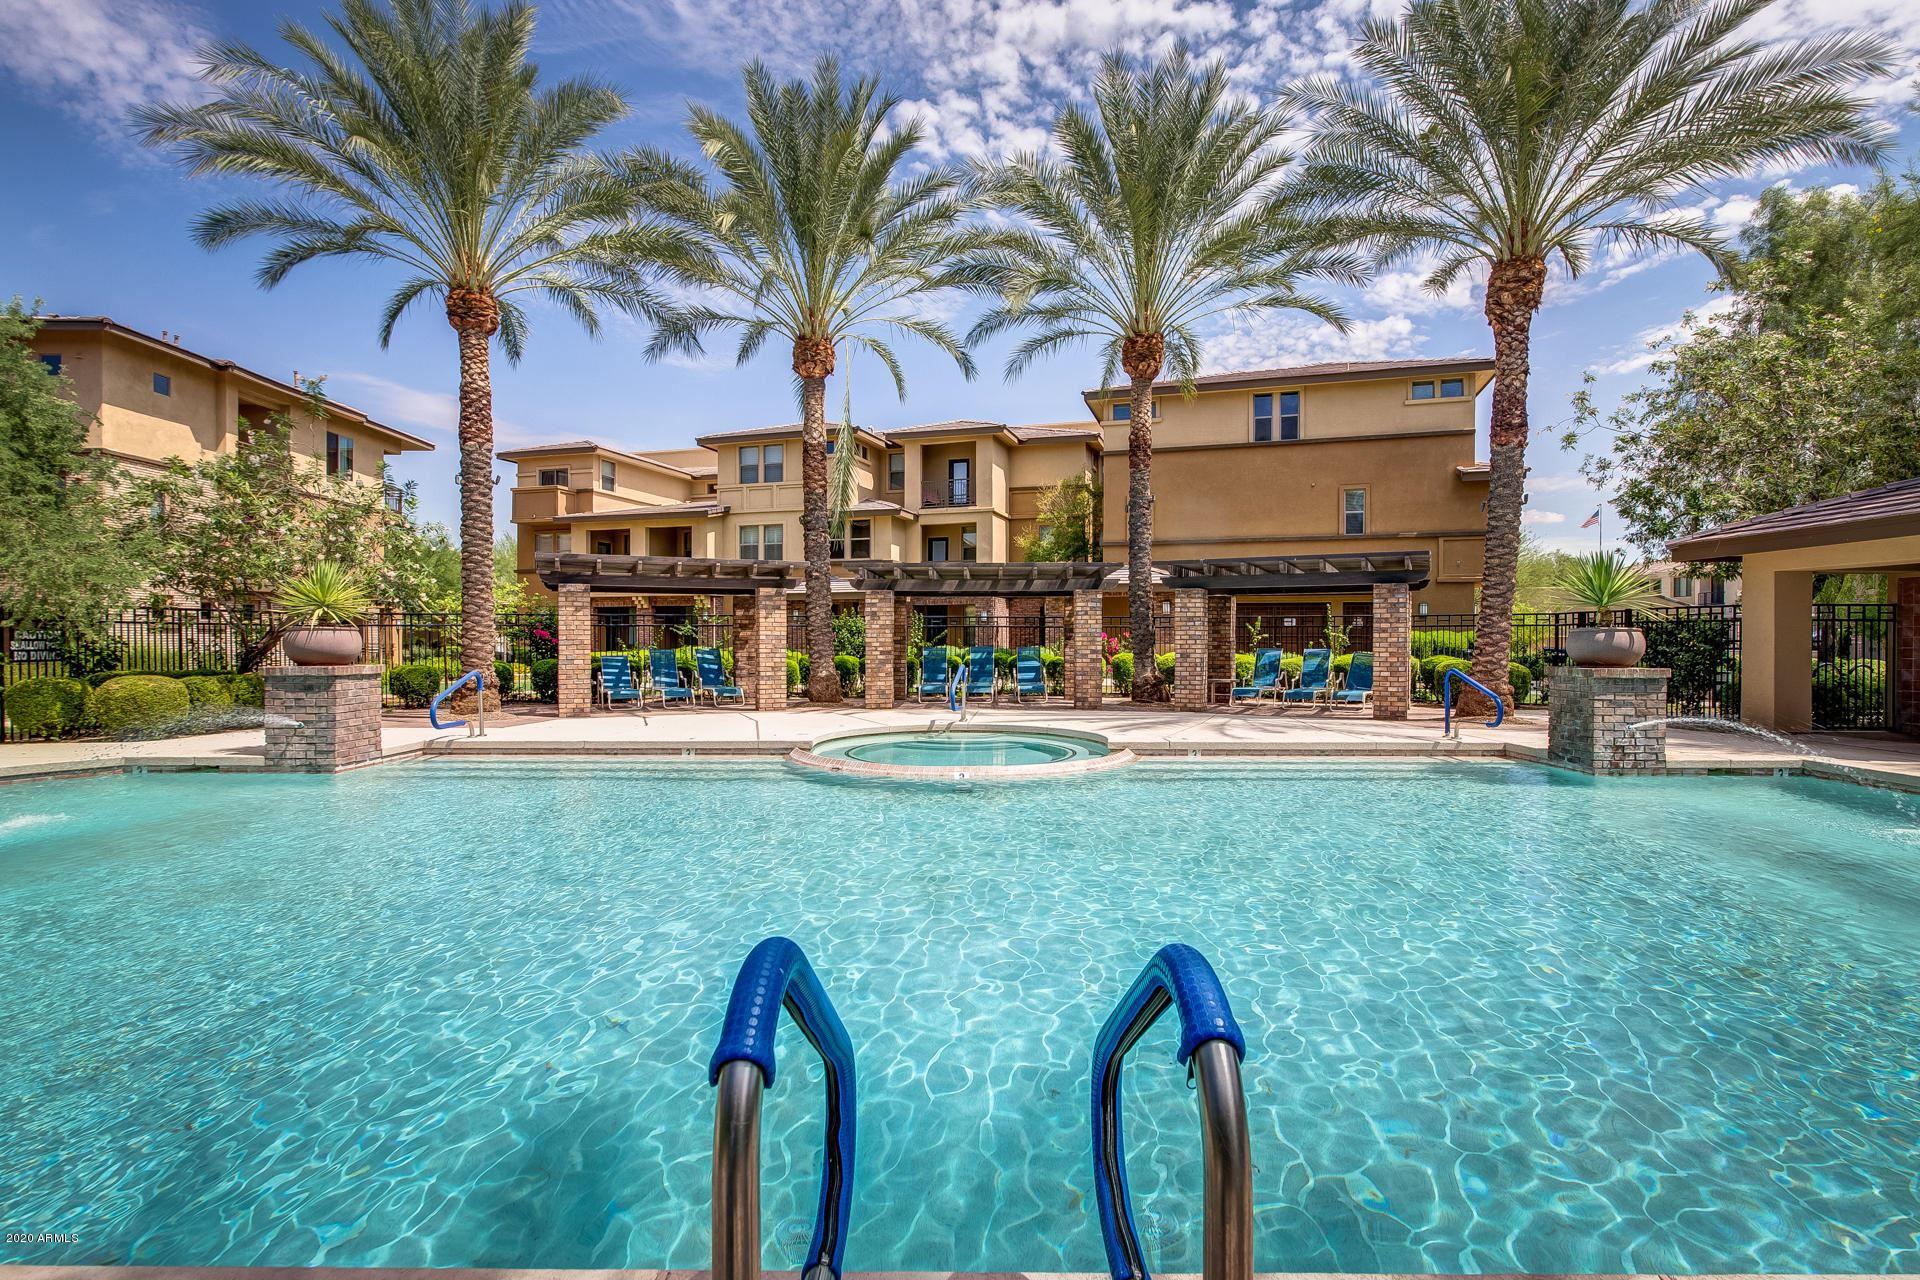 17850 N 68TH Street #2075, Phoenix, AZ 85054 - MLS#: 6072974